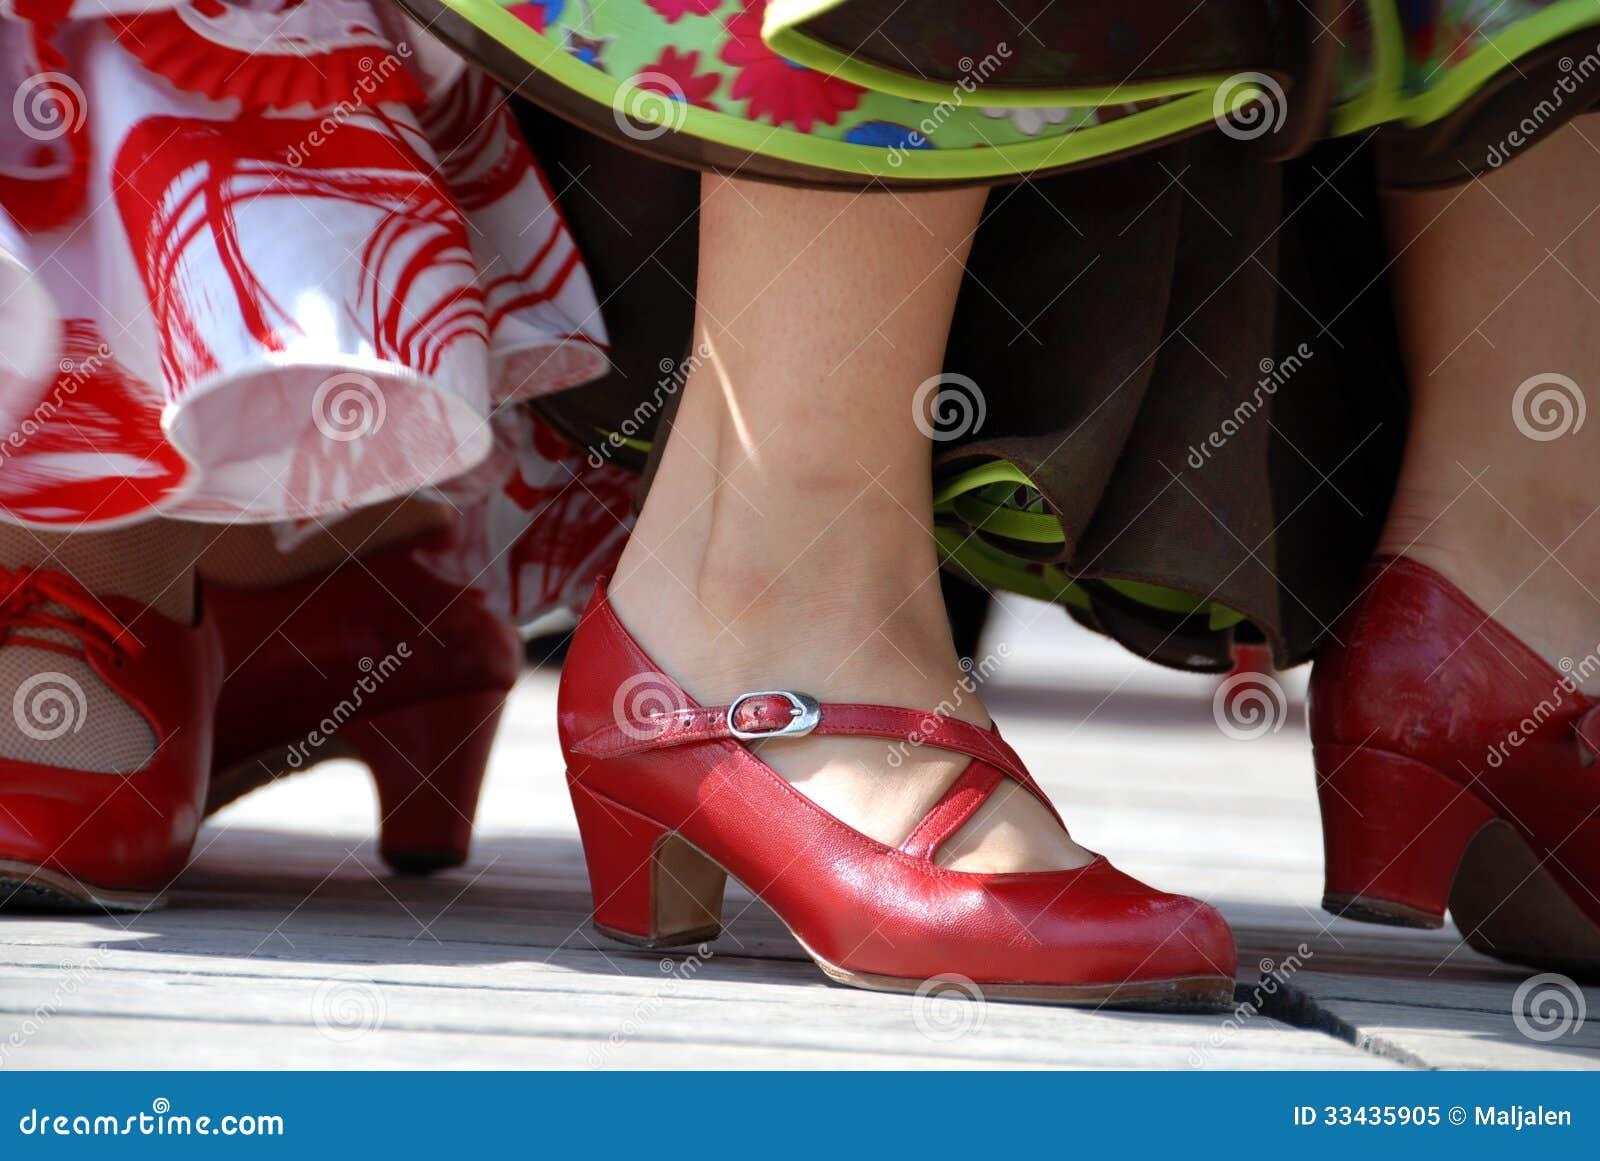 flamenco-professional-flamenco-shoes-flamenco-shoes-885f0.jpg